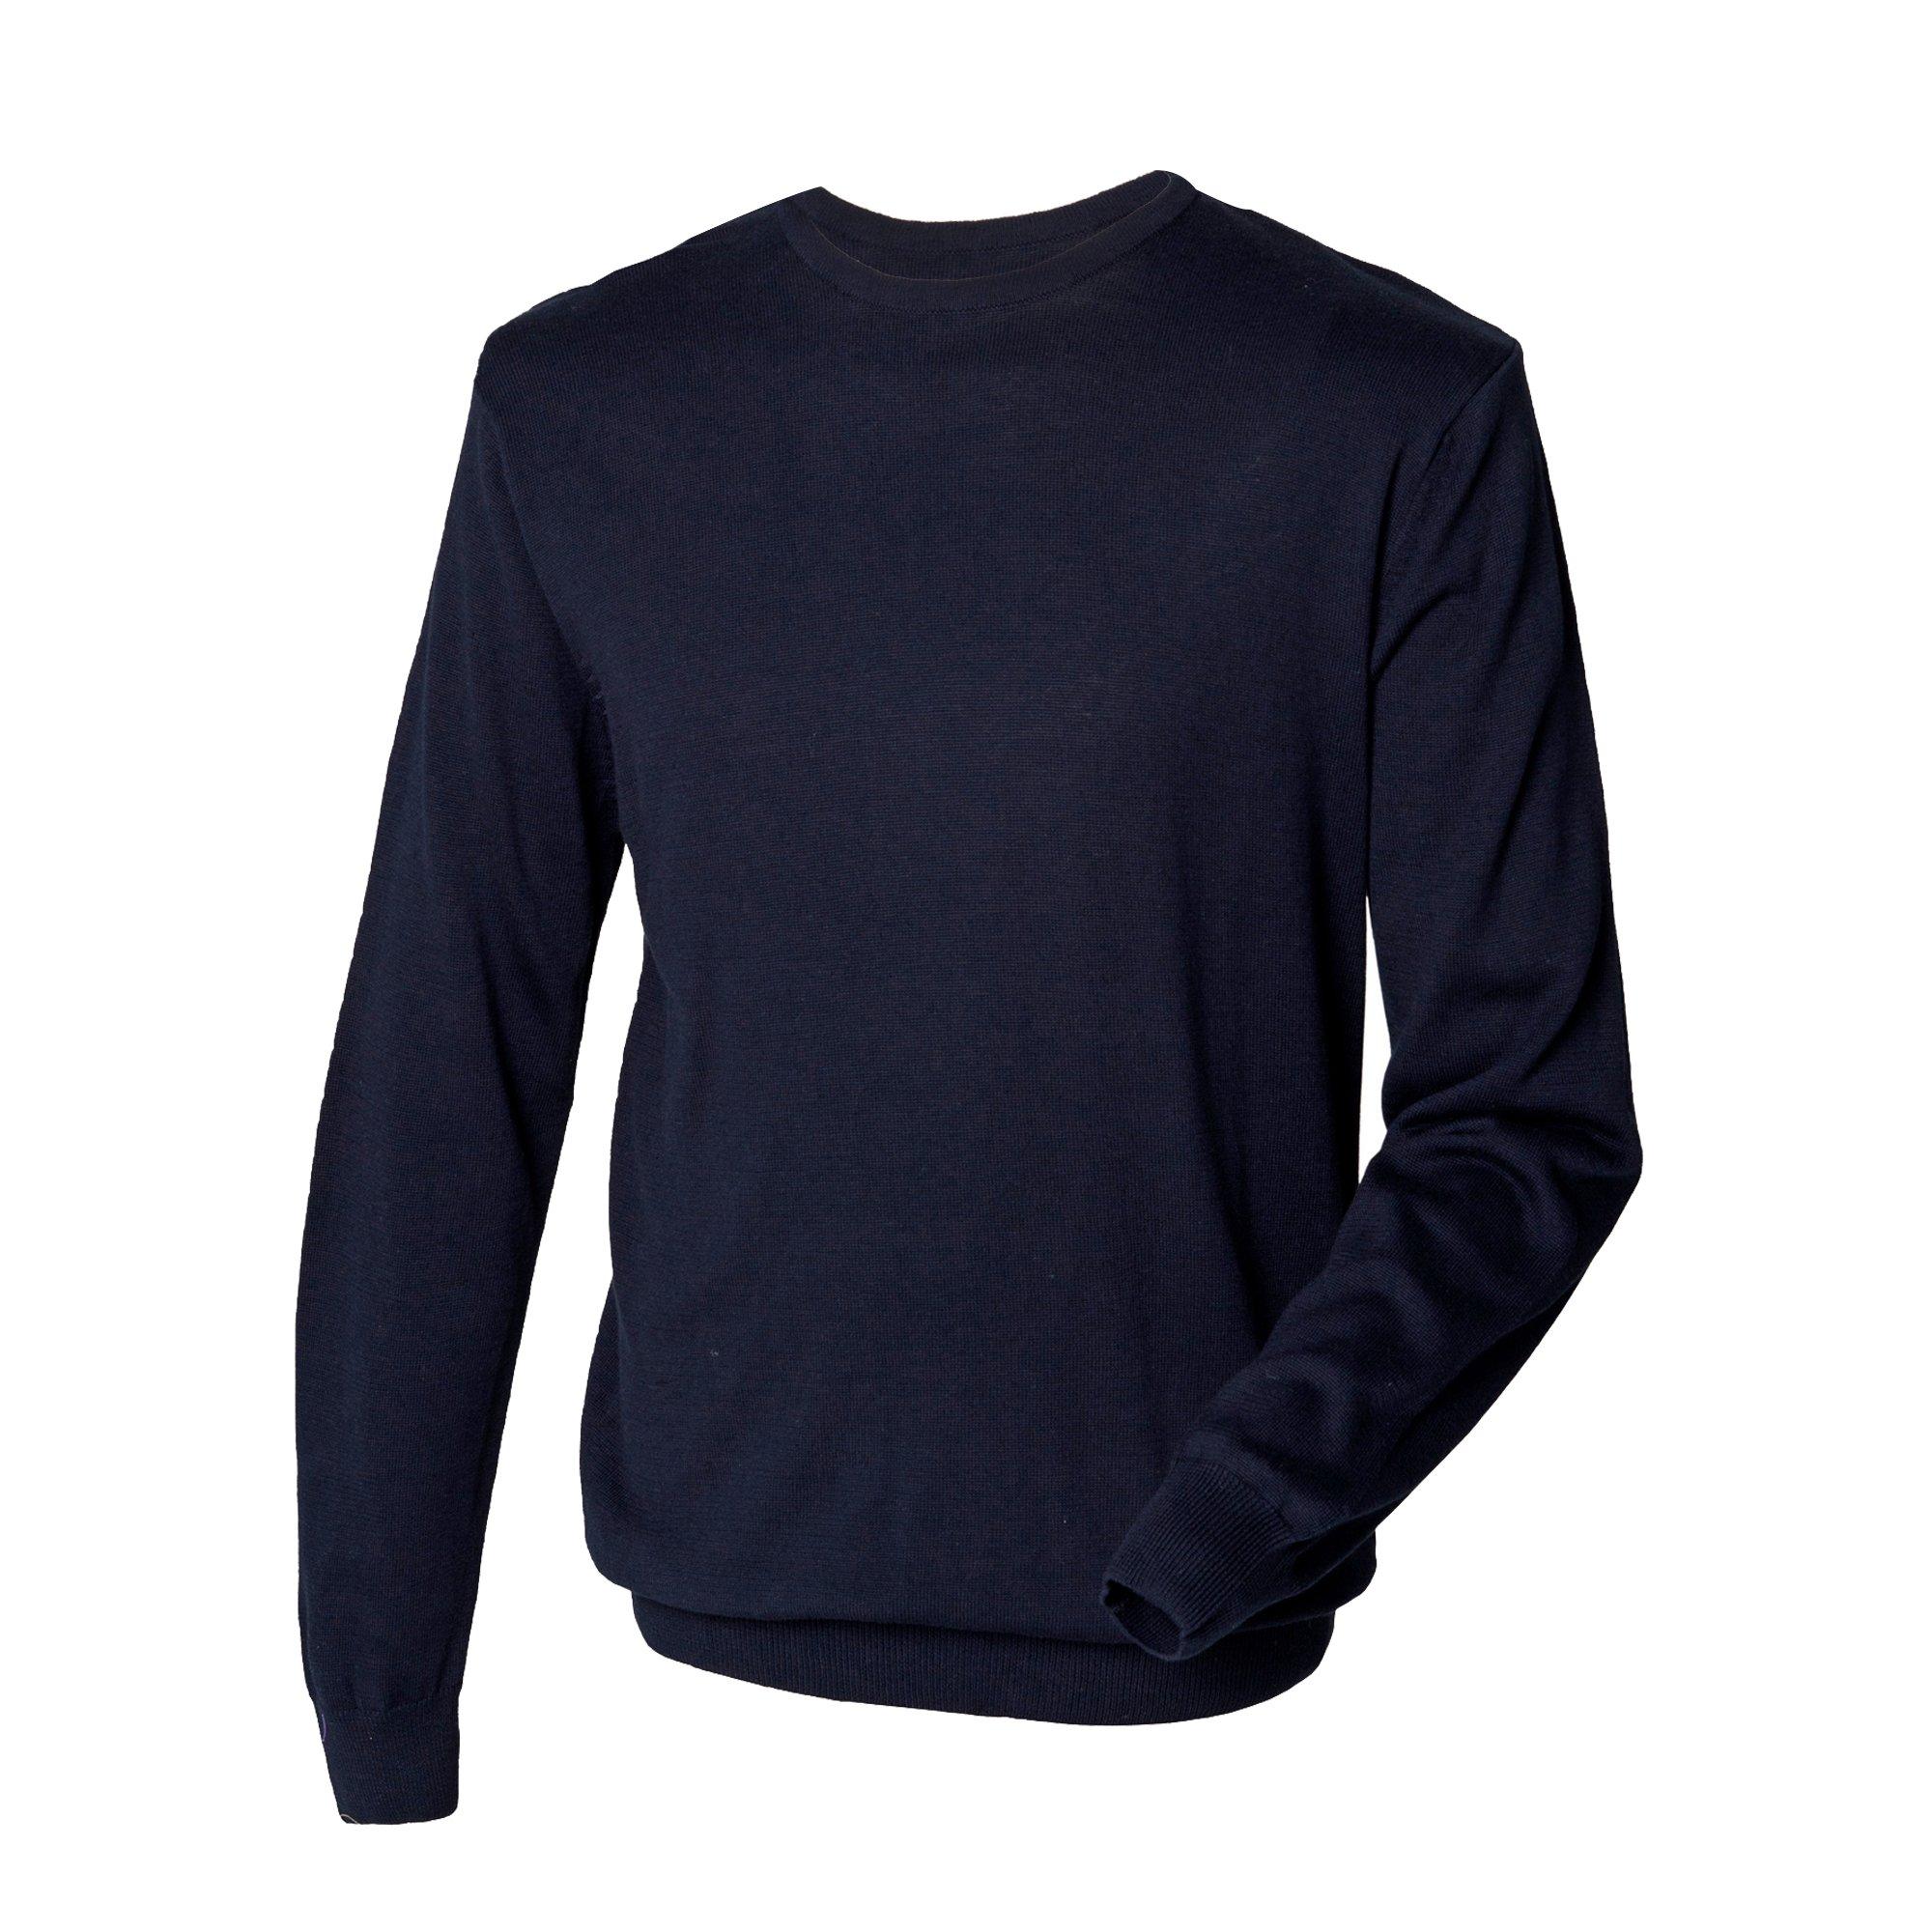 Henbury Mens Crew Neck 12 Gauge Fine Knit Jumper / Sweatshirt (XXXL) (Navy)